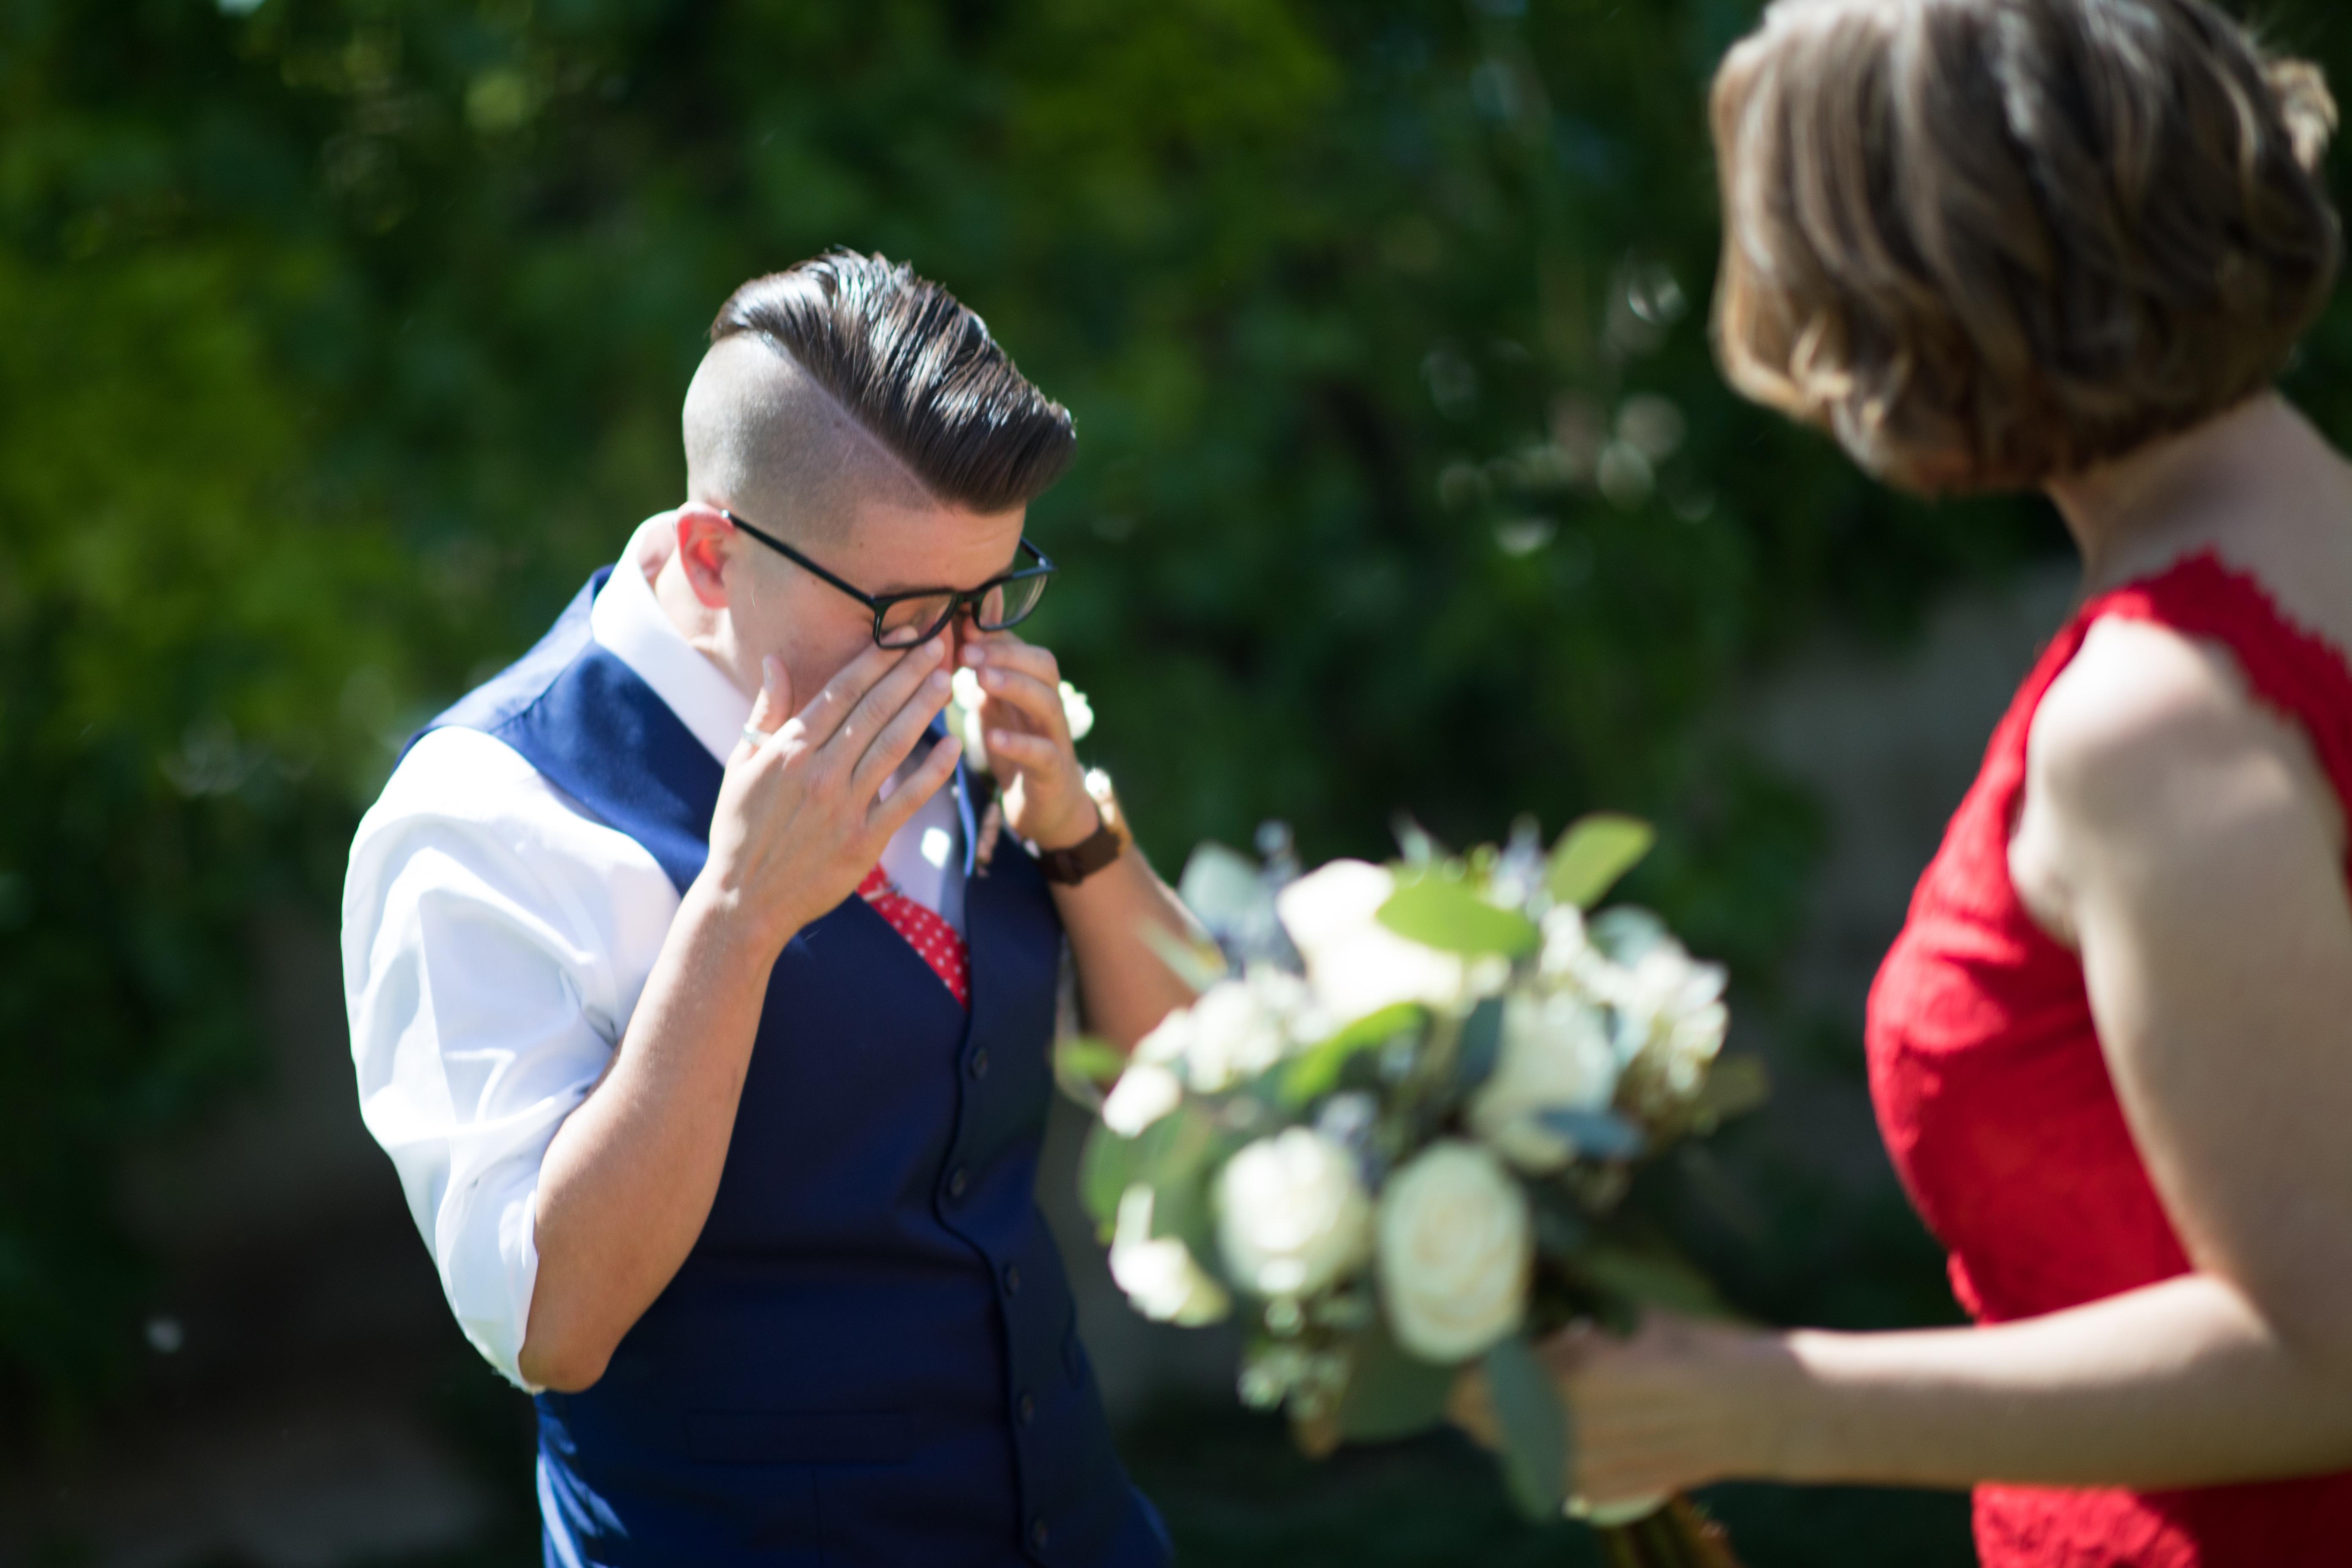 Bak & Pepin Wedding - The Couple-33